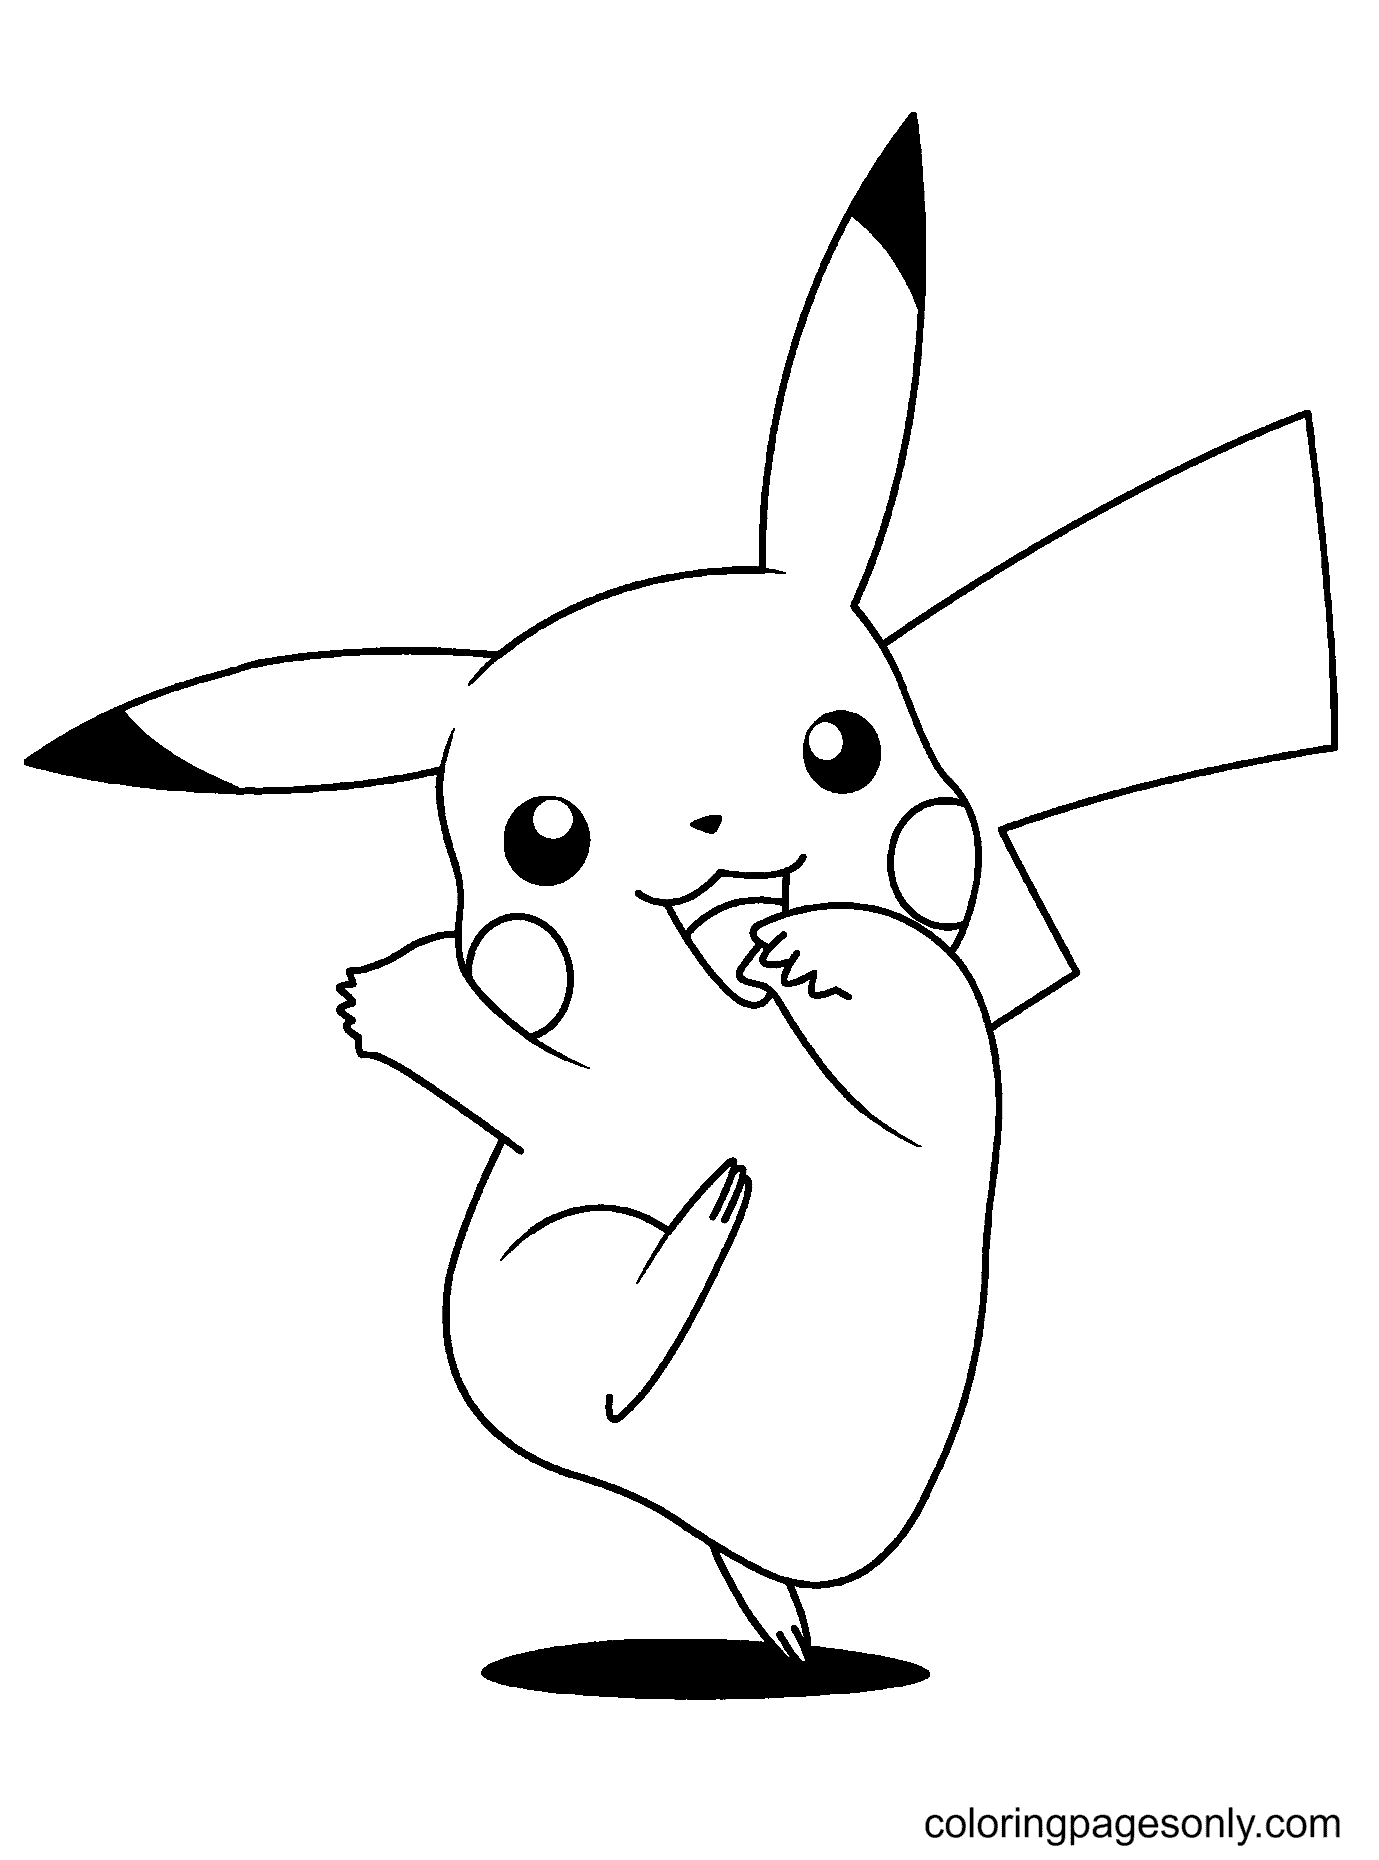 Pikachu Dancing Coloring Page